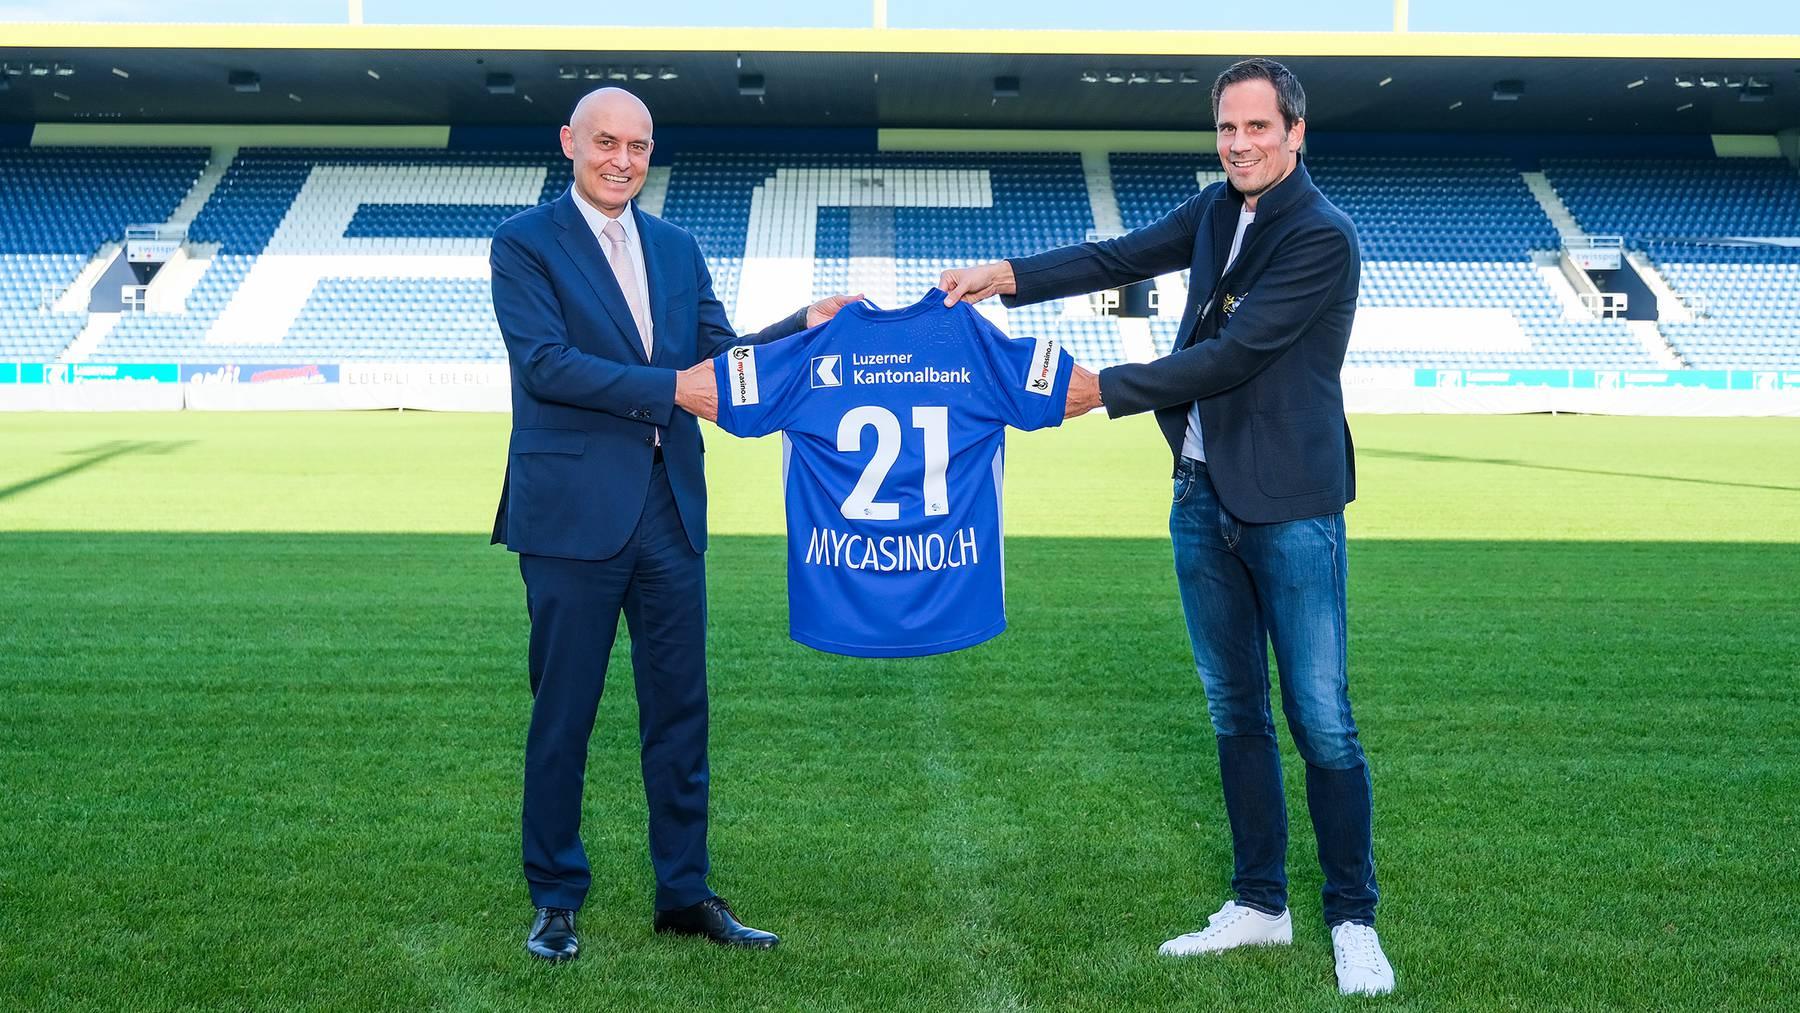 FC Luzern_mycasino.ch